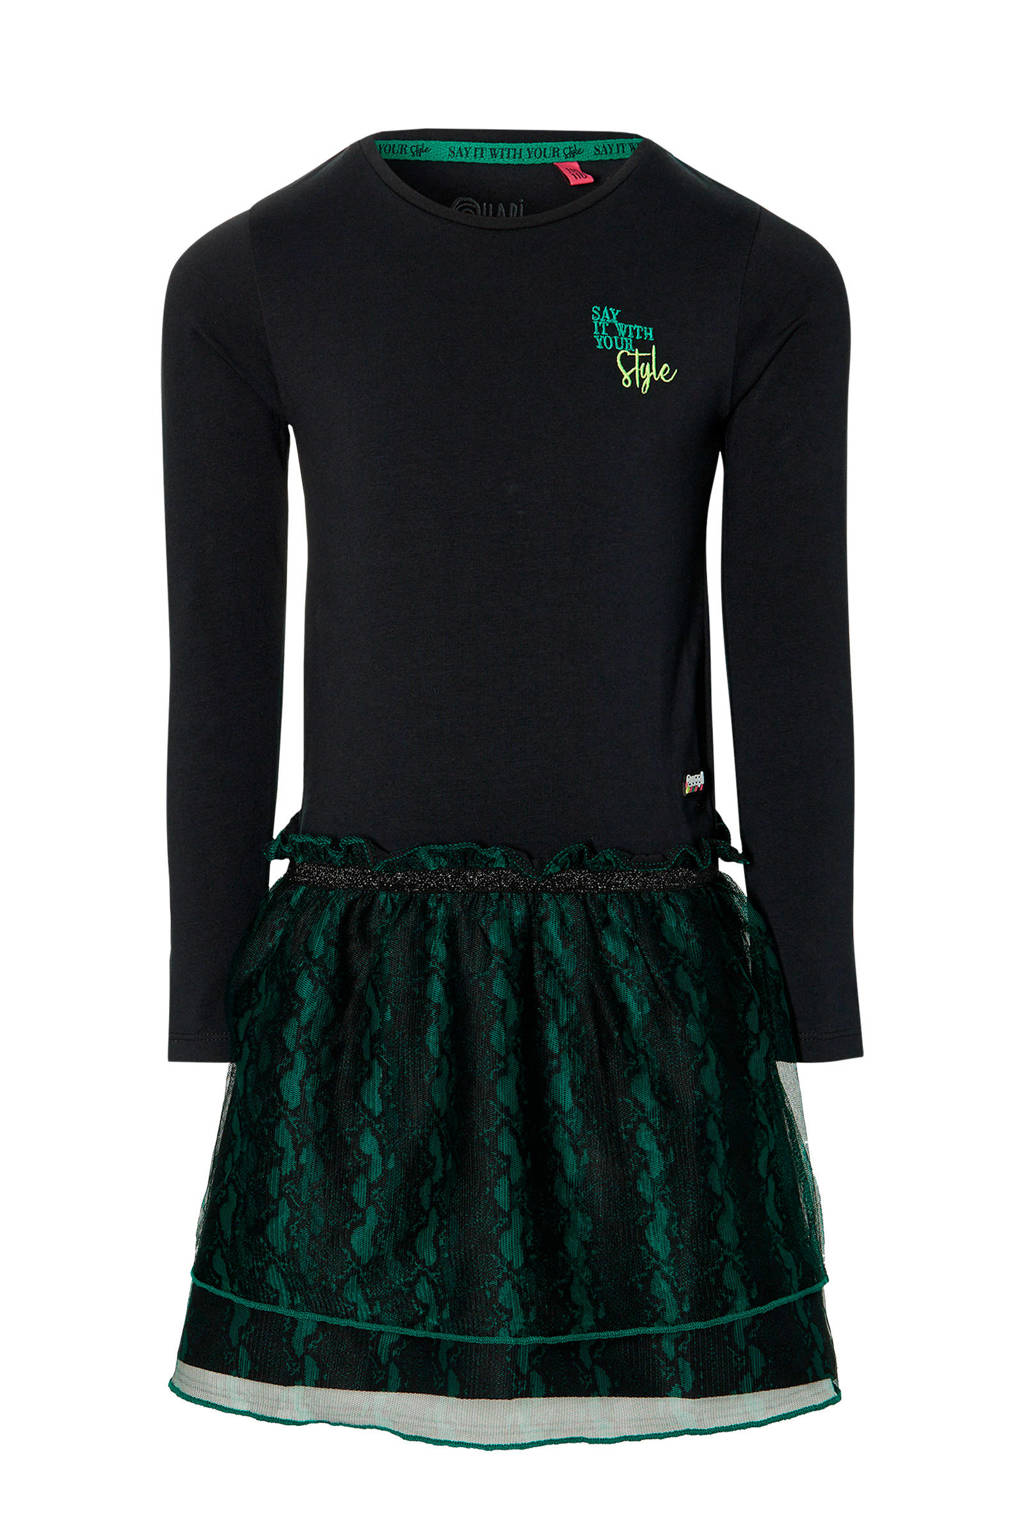 Quapi Girls jurk Daimy met slangenprint zwart/groen, Zwart/groen